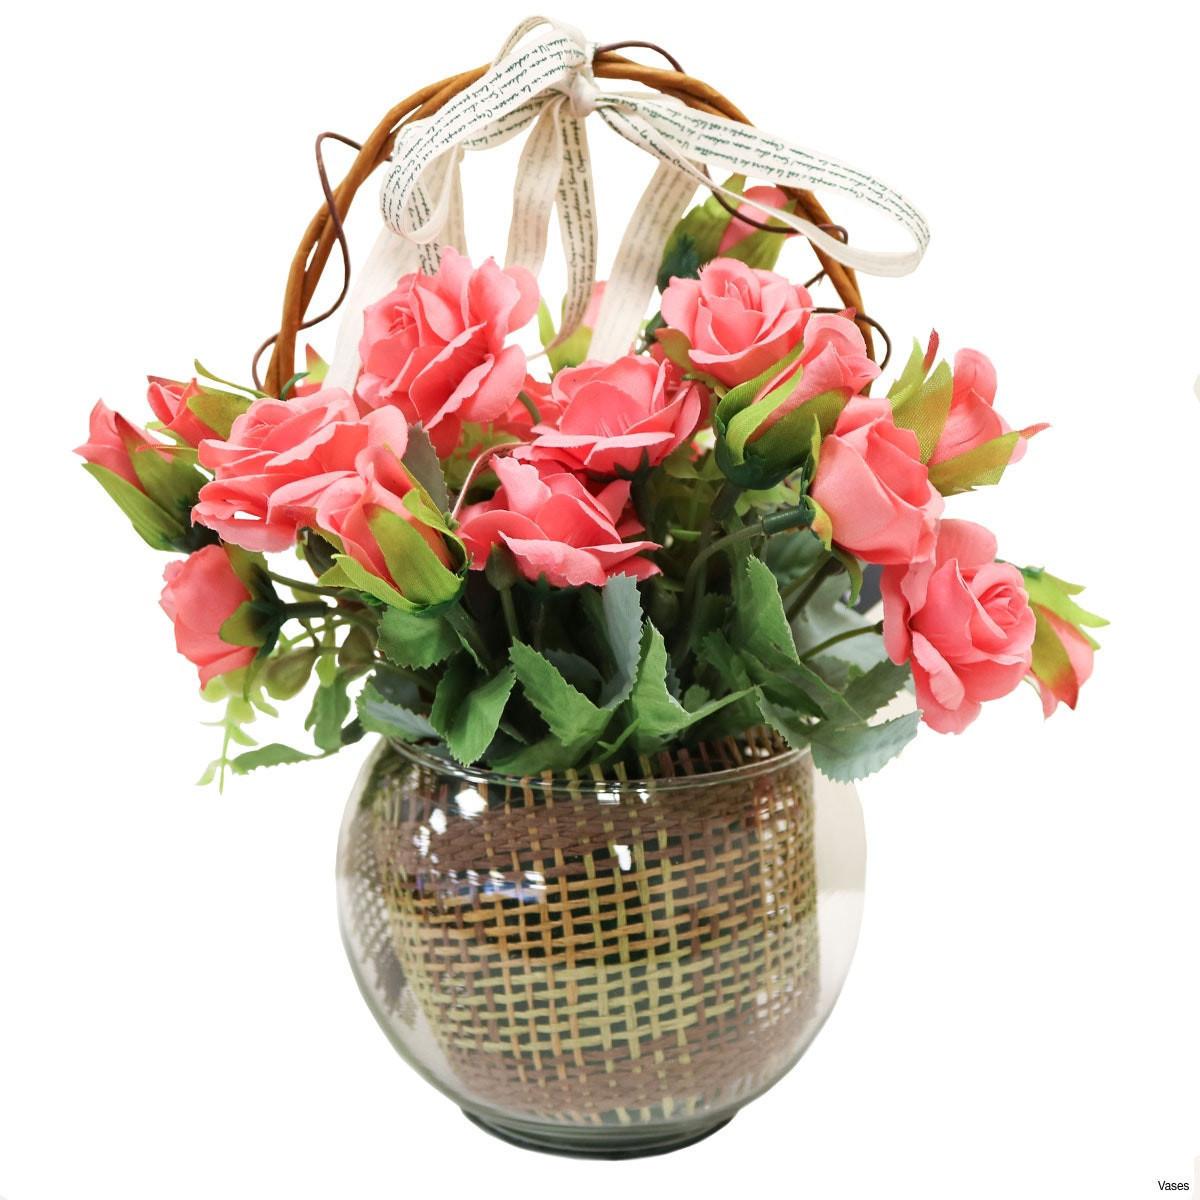 slanted glass vase of yellow glass vase images bf142 11km 1200x1200h vases pink flower intended for bf142 11km 1200x1200h vases pink flower vase i 0d gold inspiration